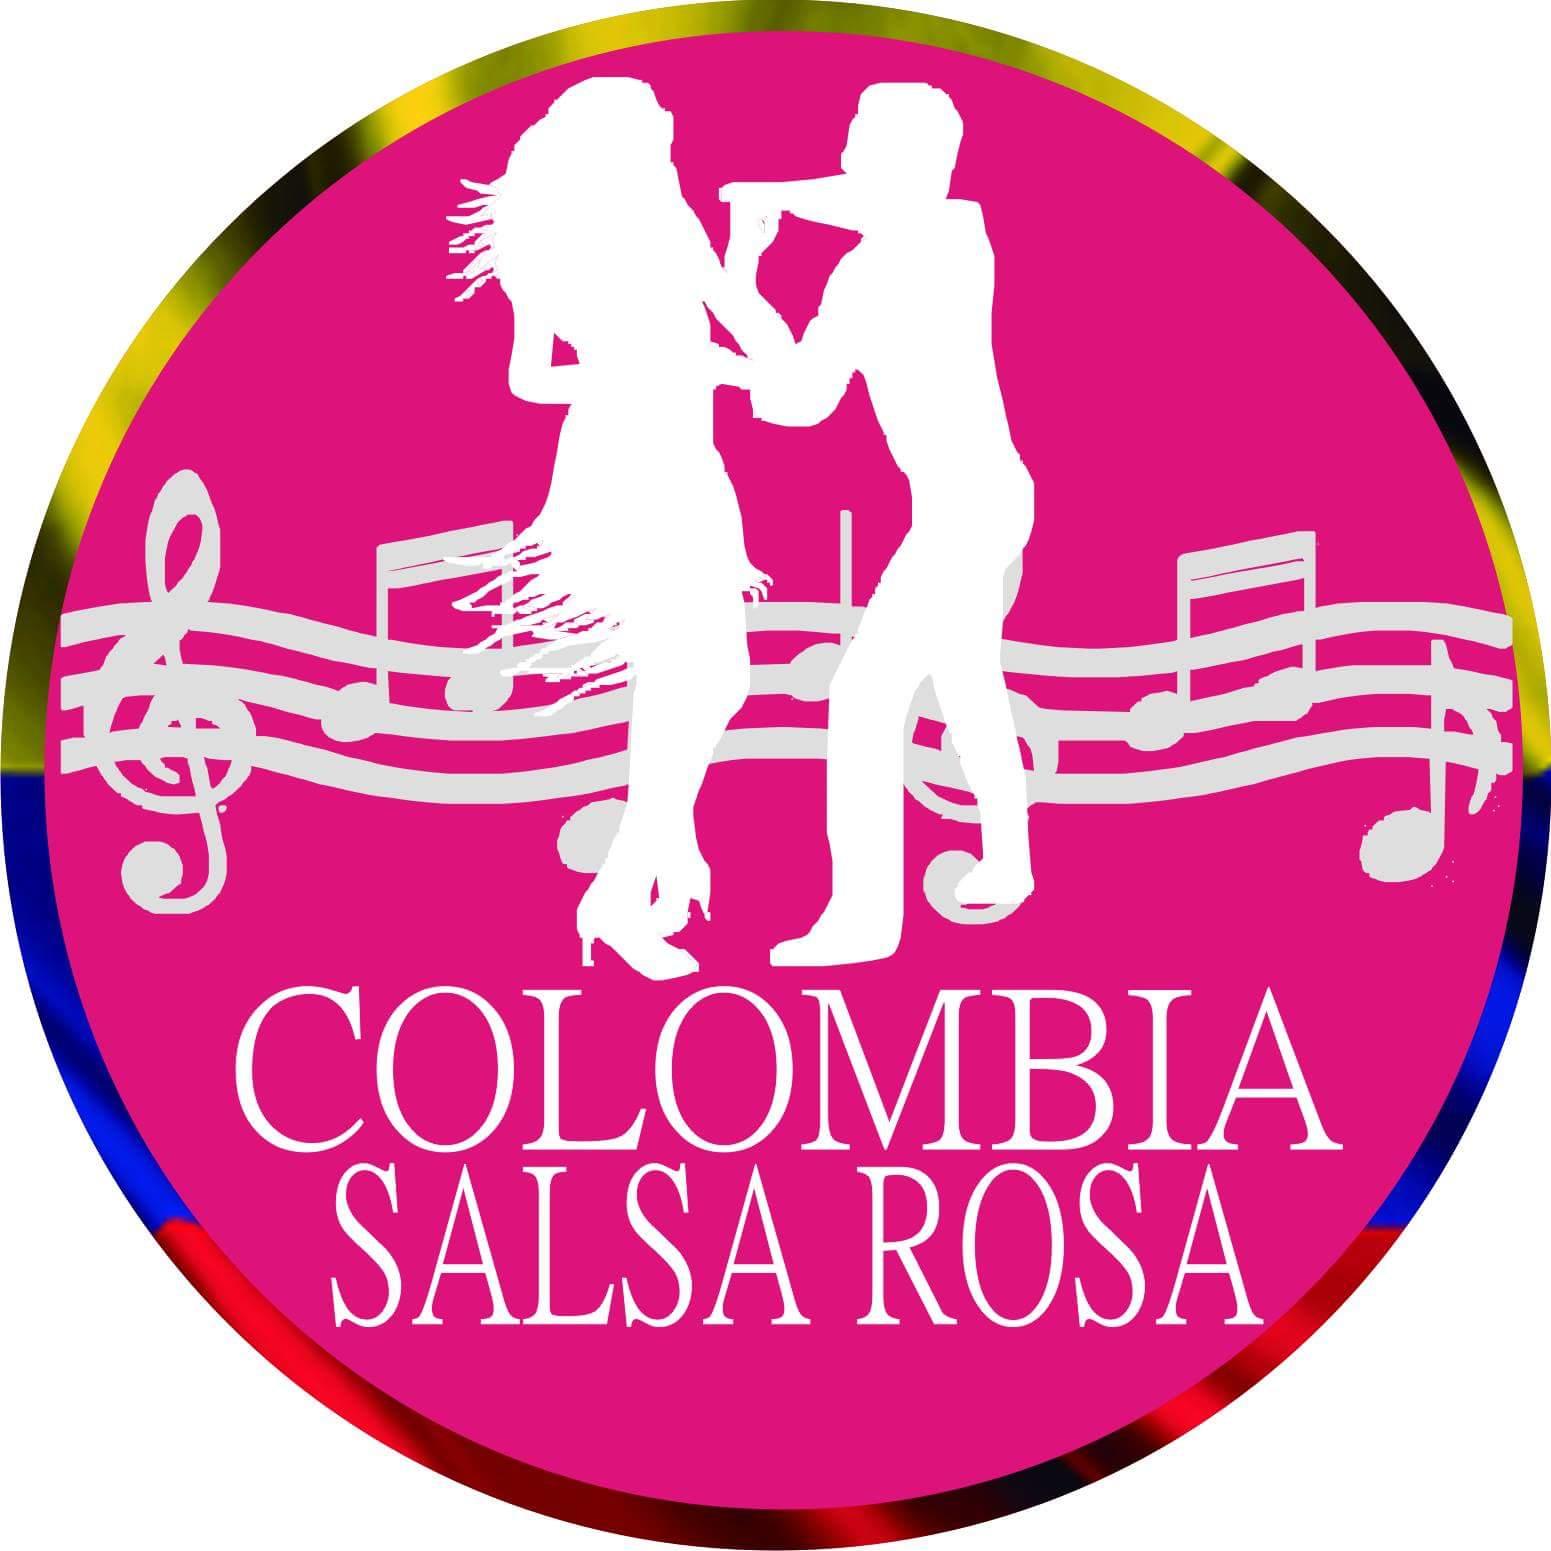 Colombia Salsa Rosa